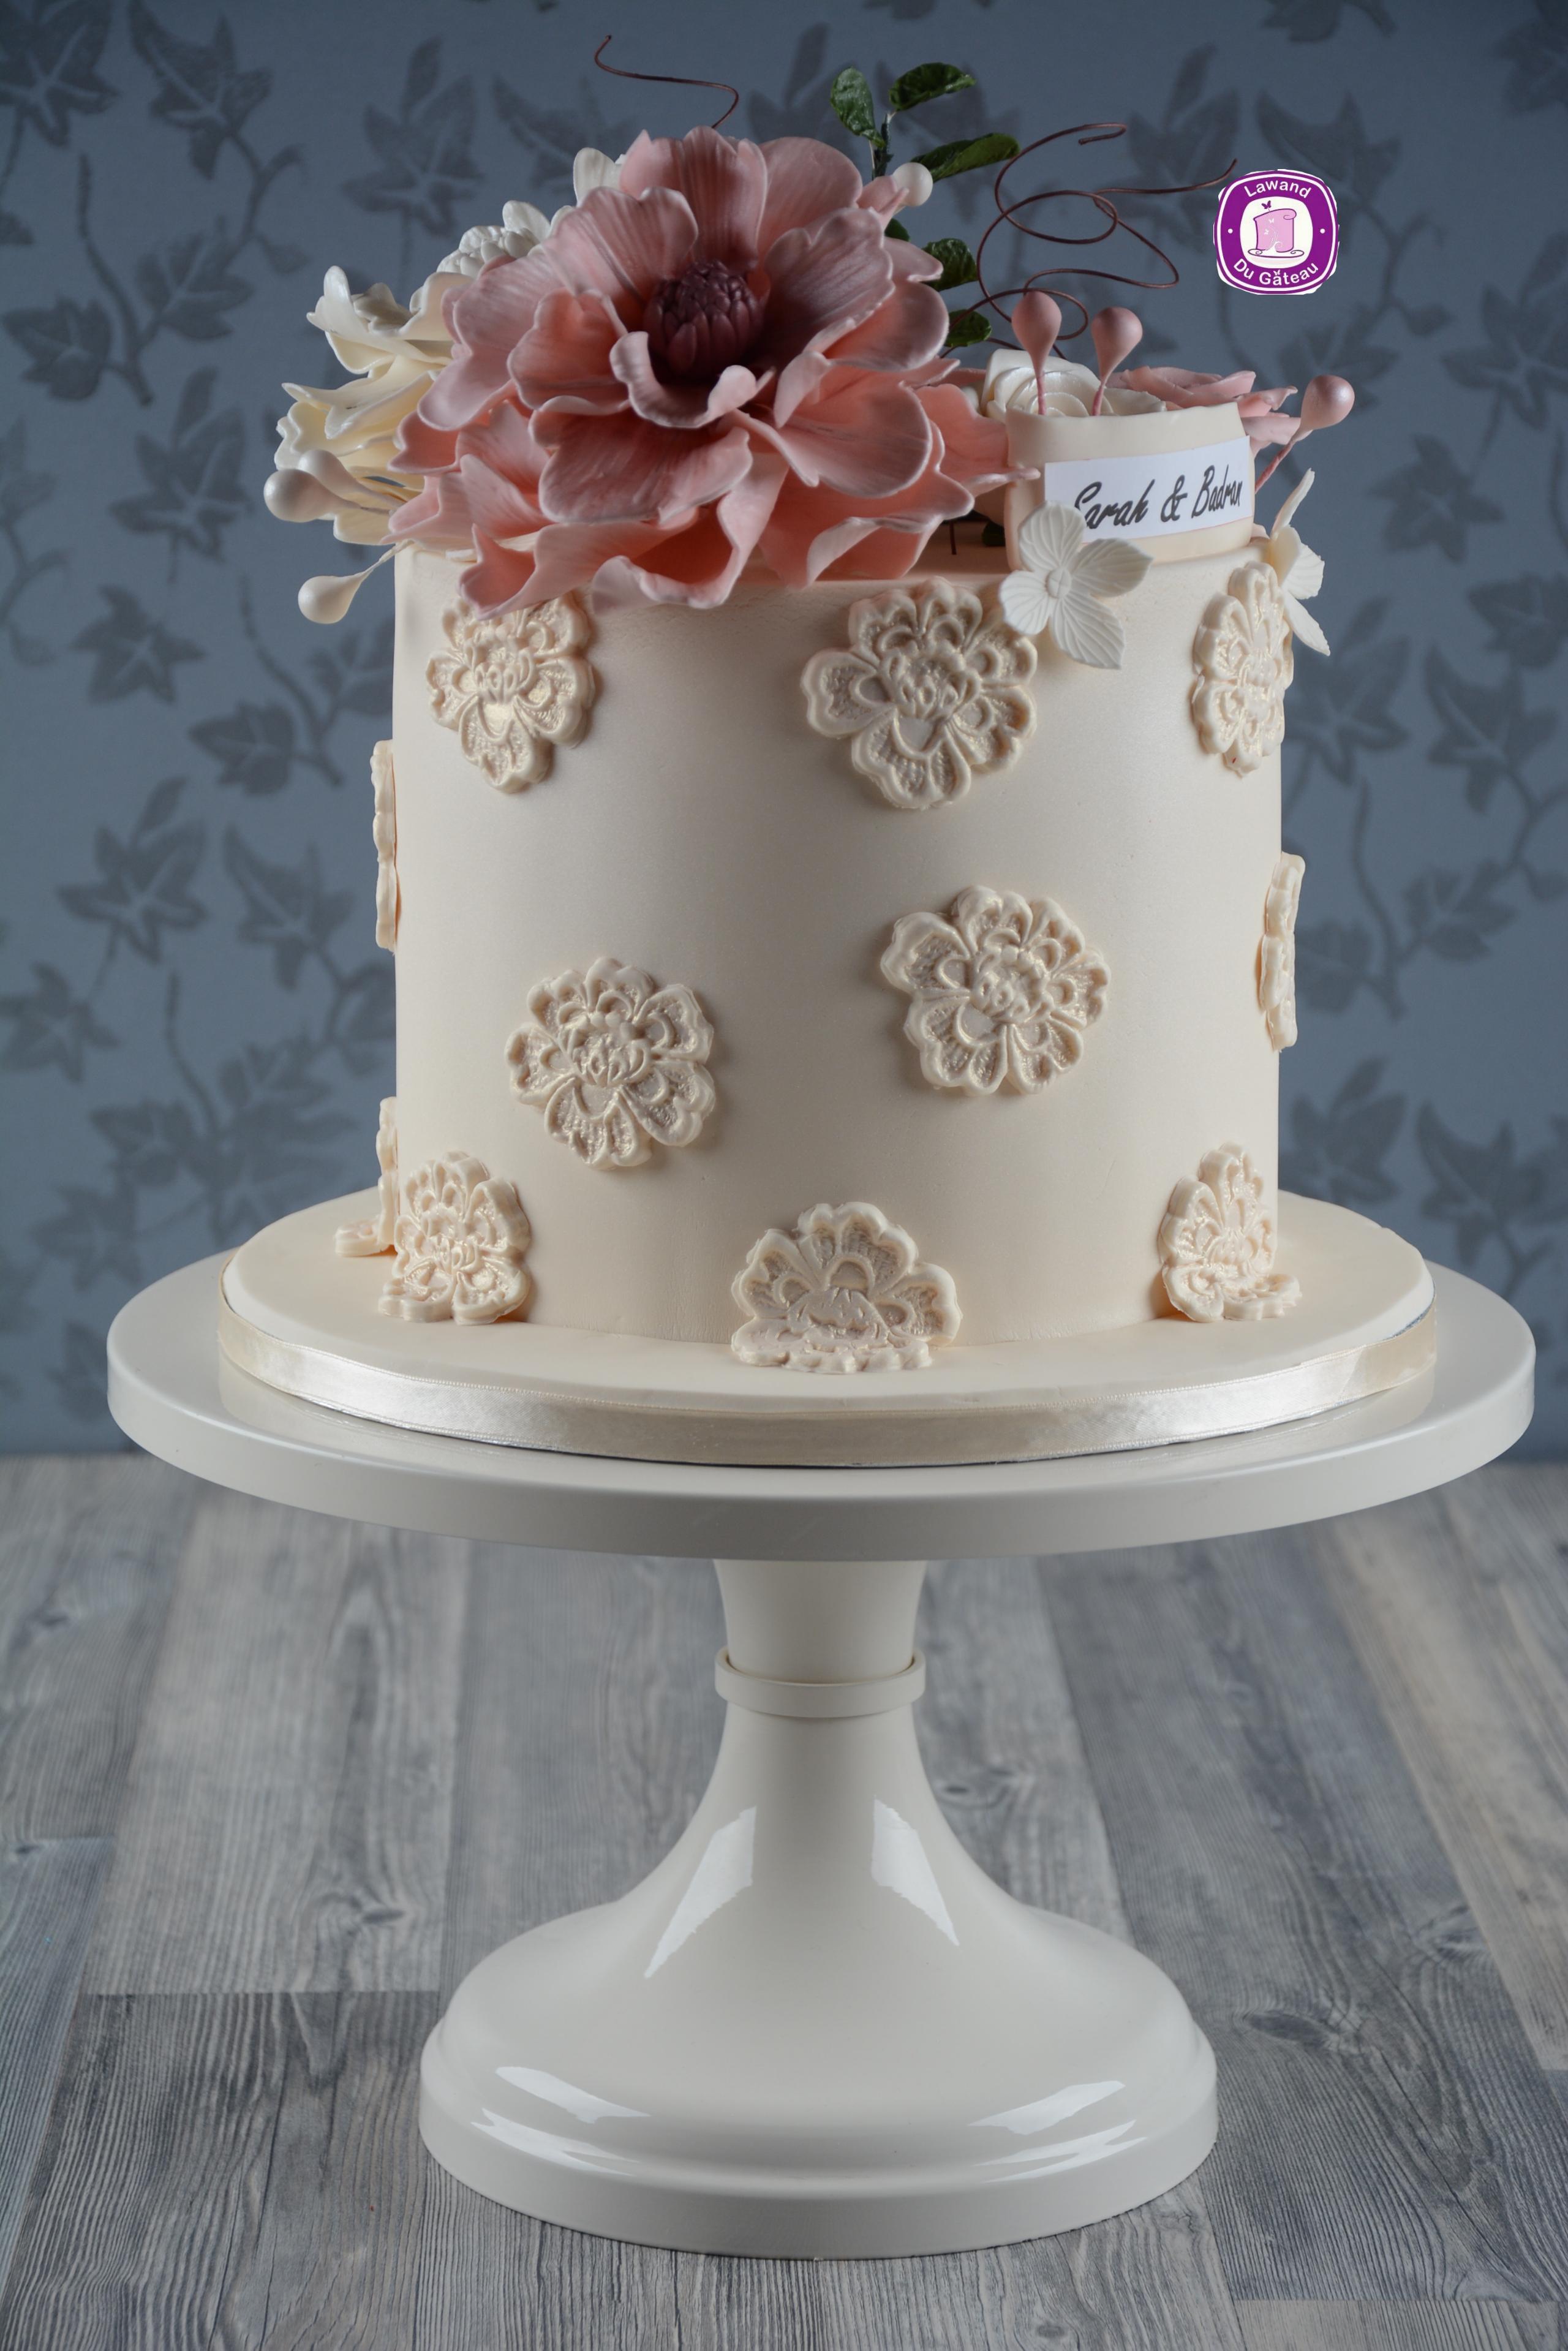 White and light pink wedding cake